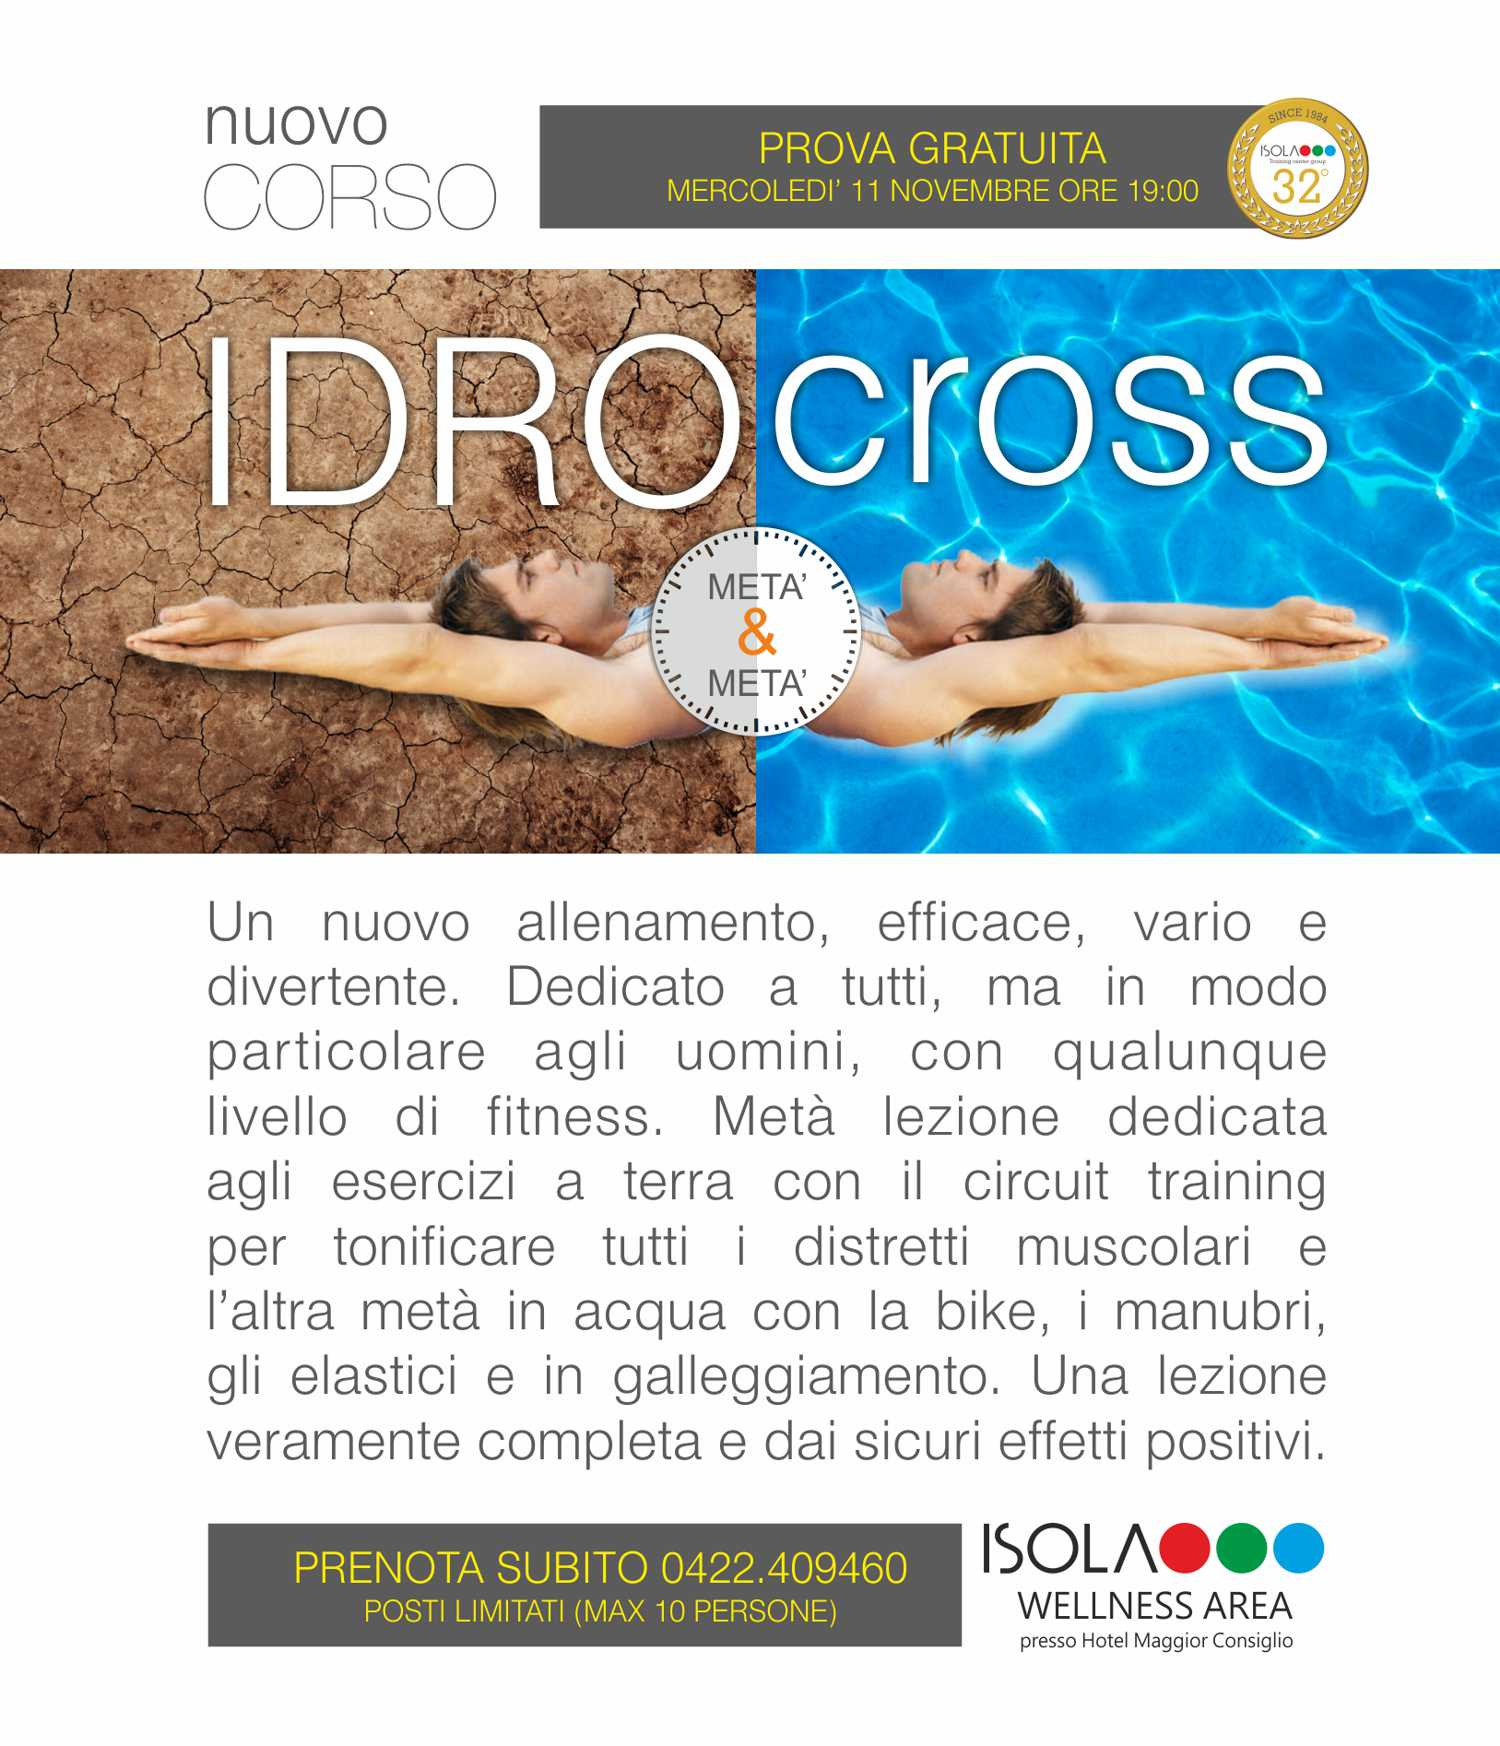 idrocross